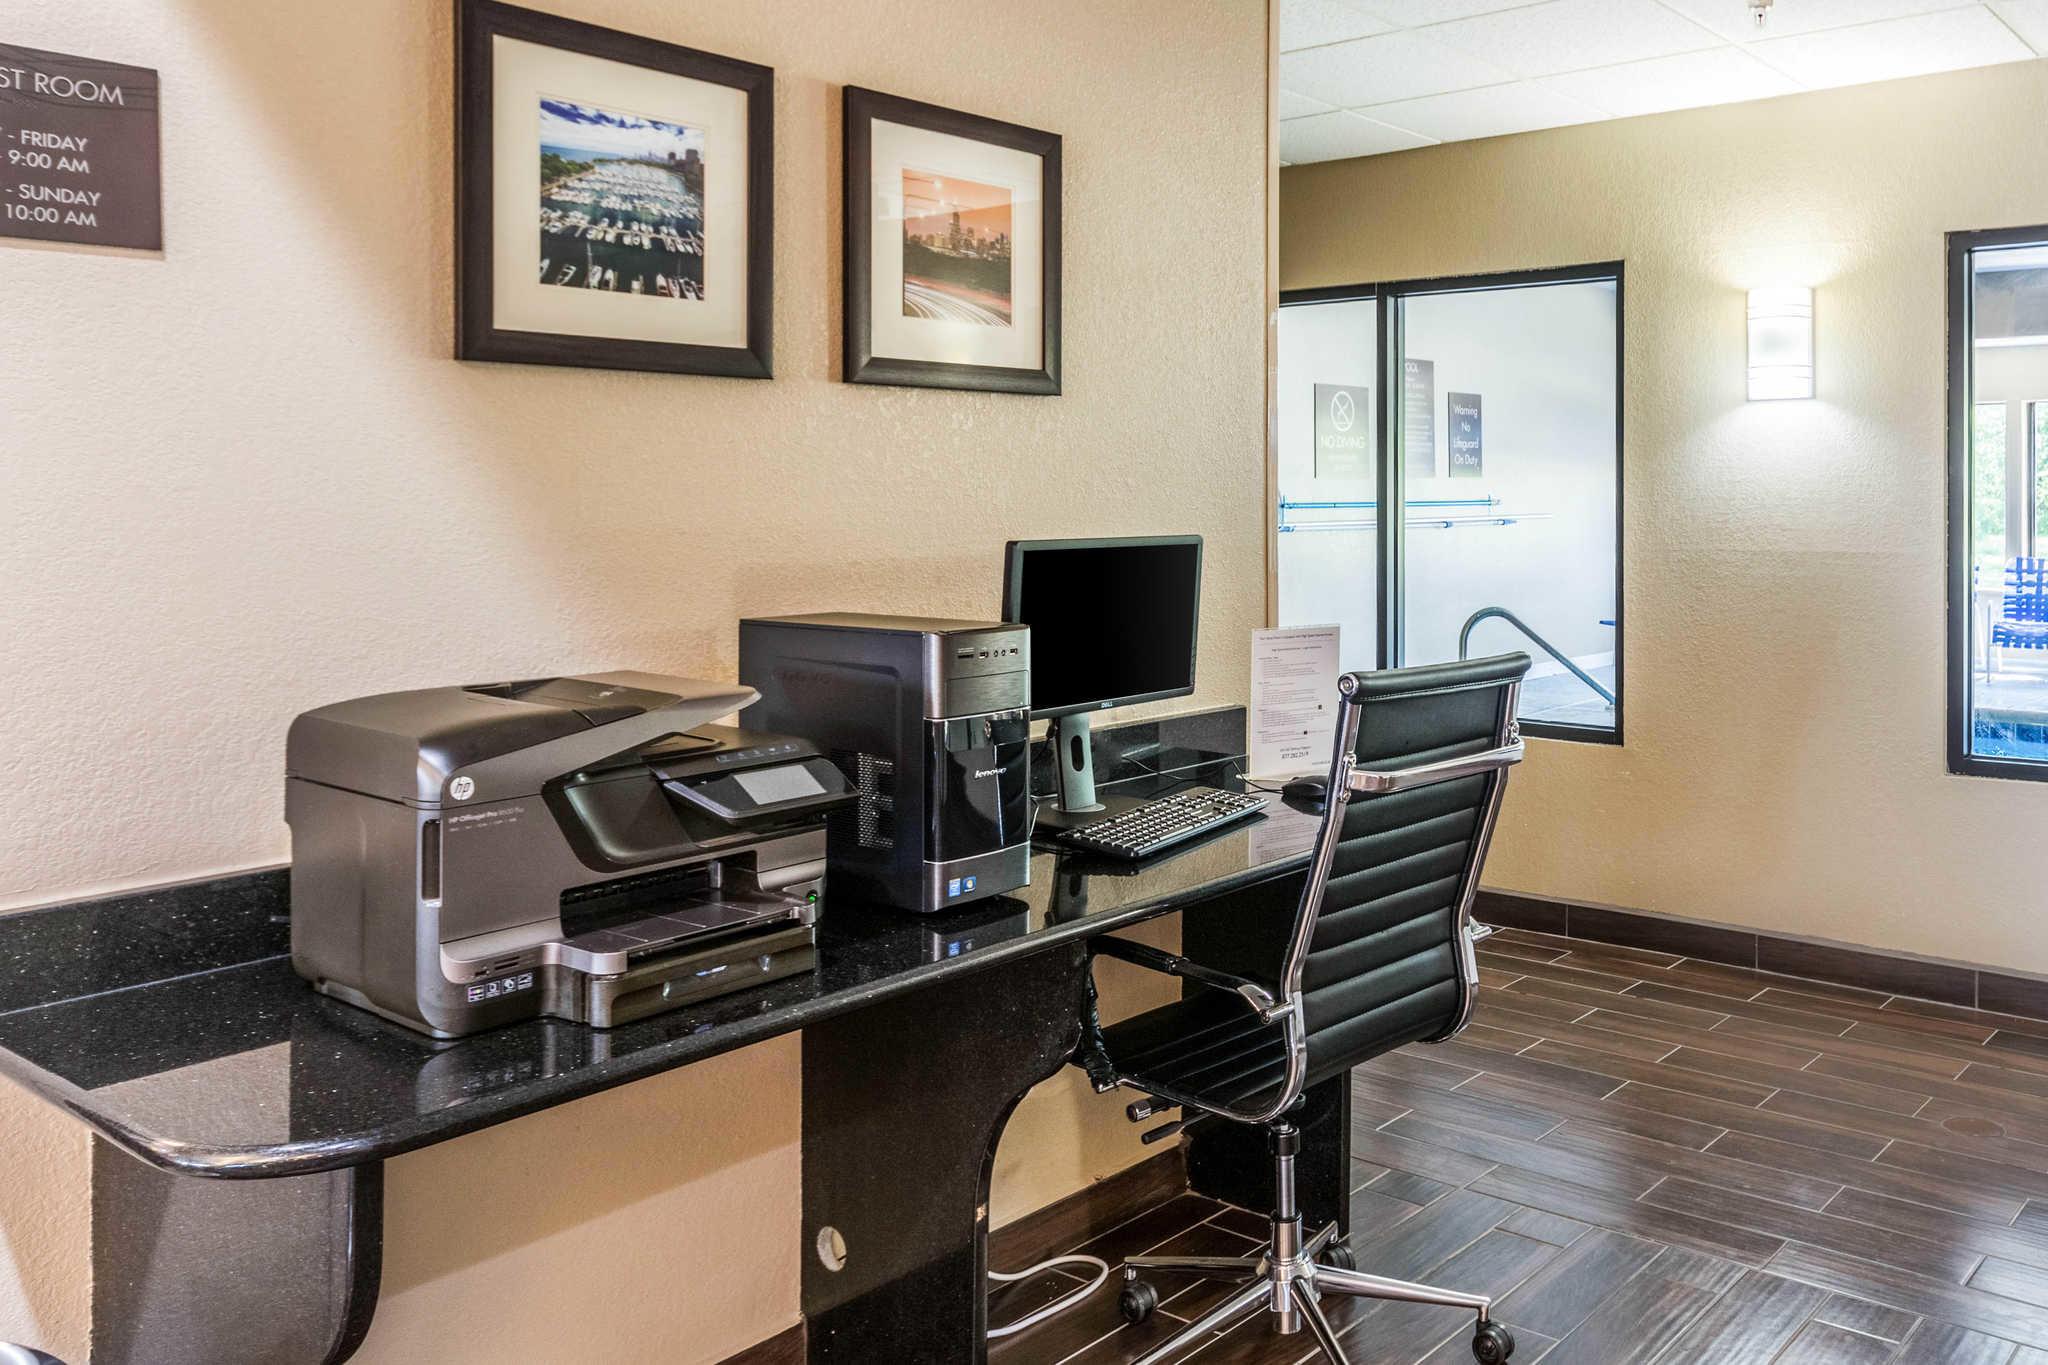 Comfort Inn & Suites North Aurora - Naperville image 37